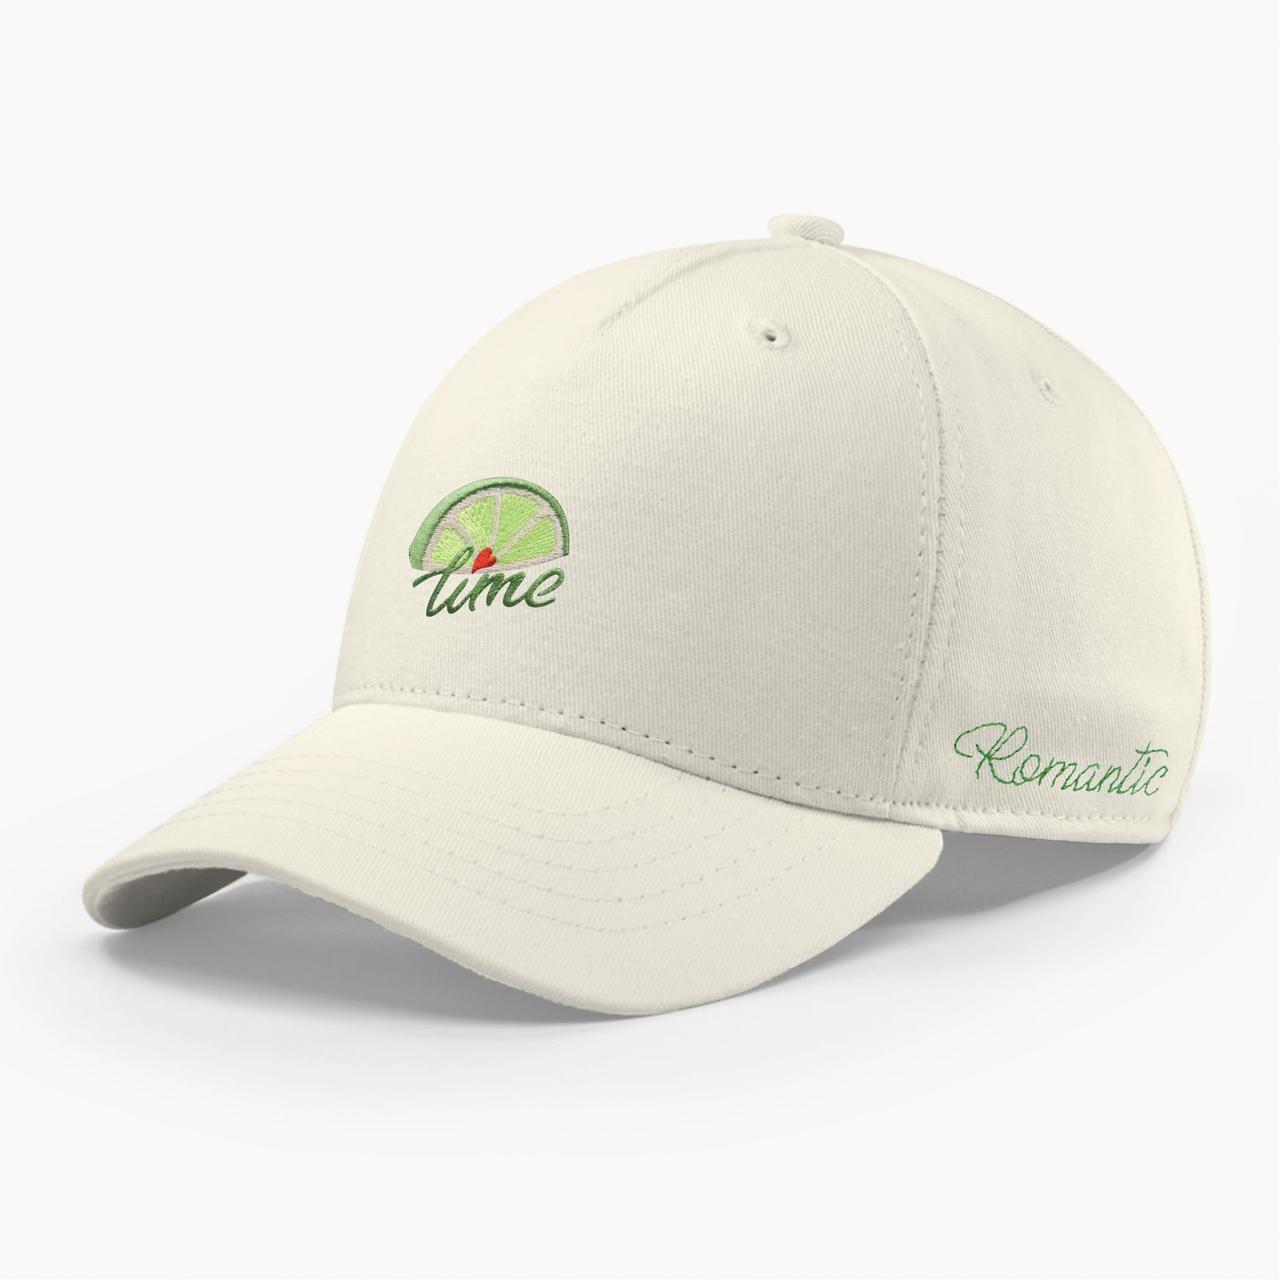 Женская кепка бейсболка INAL лайм S / 53-54 RU Молочный 286253